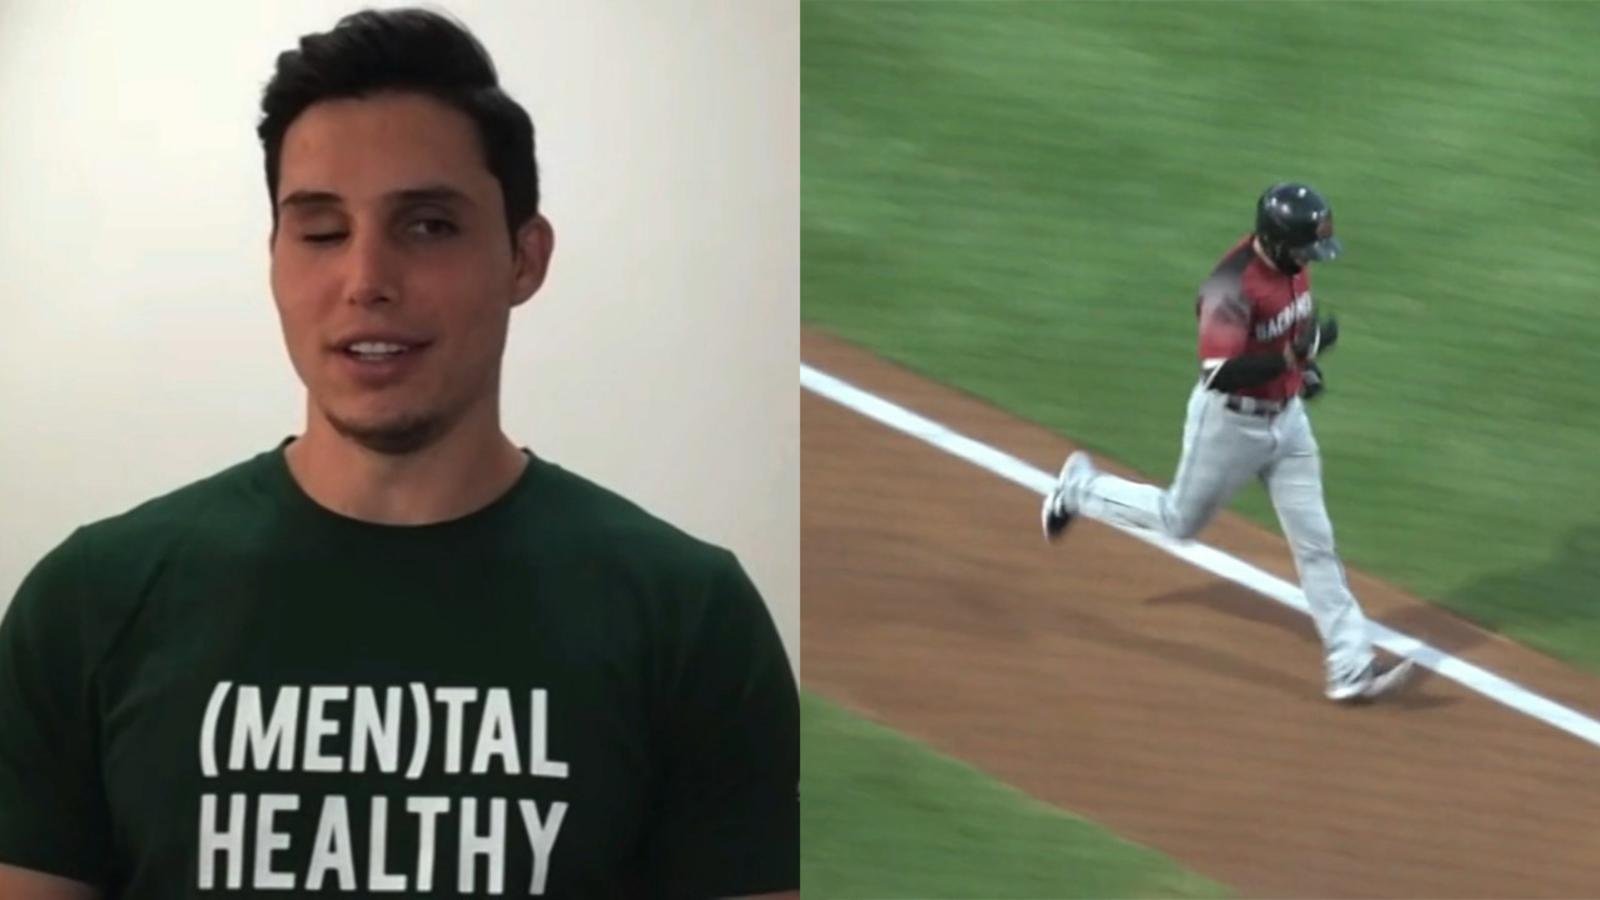 San Francisco Giants' Drew Robinson wants to 'bridge gap' between players as mental health advocate